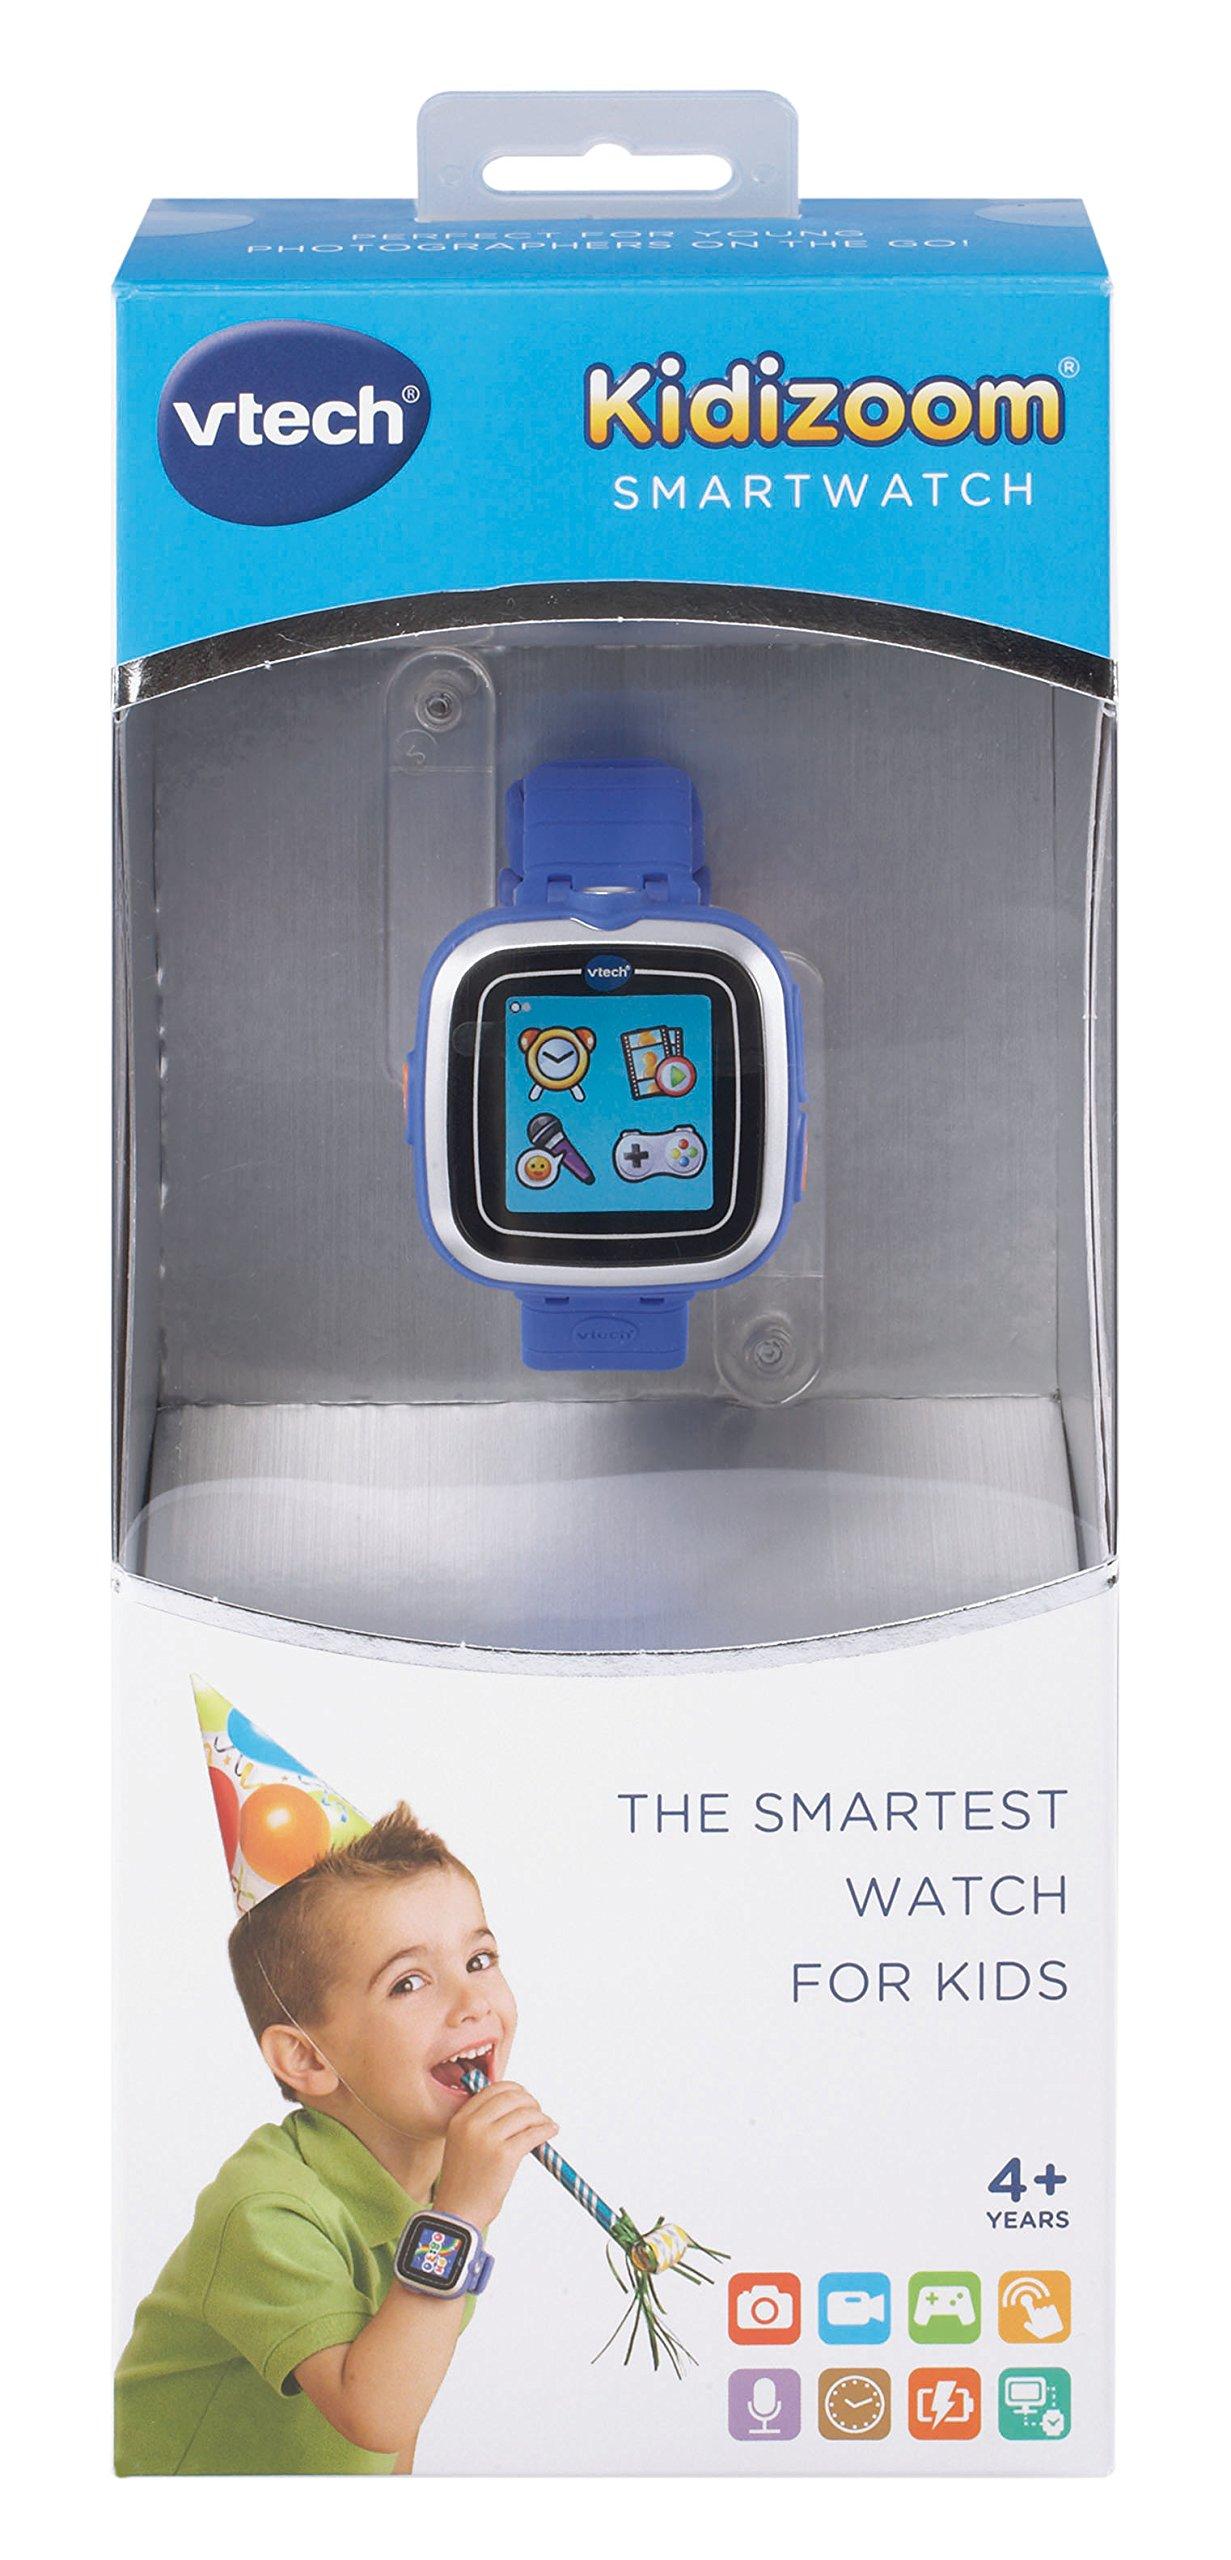 VTech Kidizoom Smartwatch, Blue (Discontinued by manufacturer) by VTech Kidizoom (Image #6)